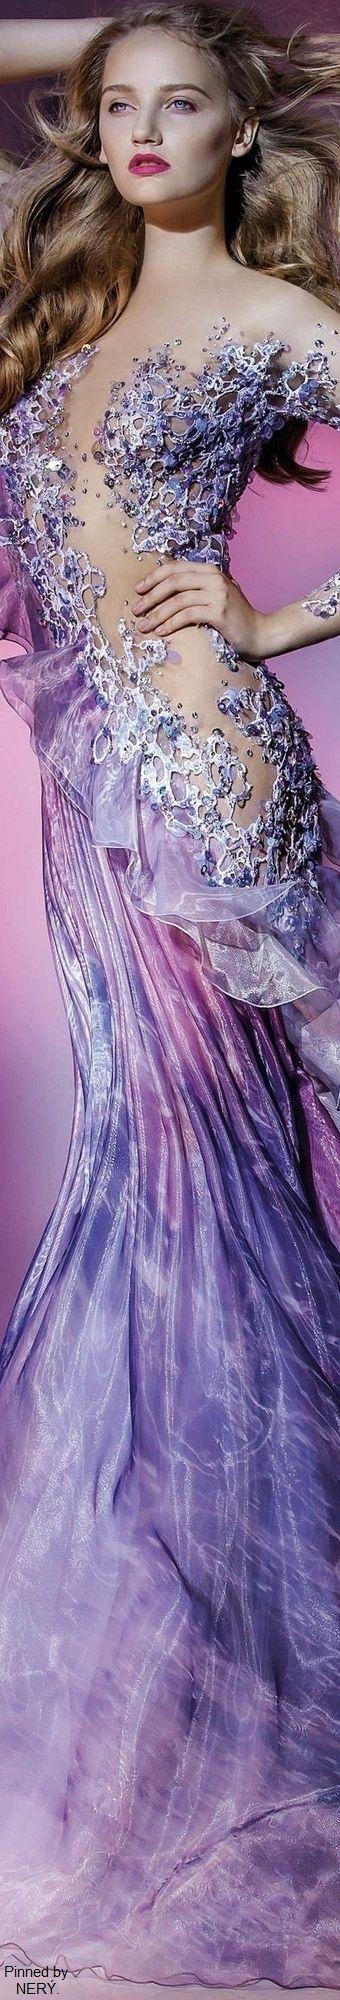 Blanka Matragi ''Elemets:Air'' 2017 Collection